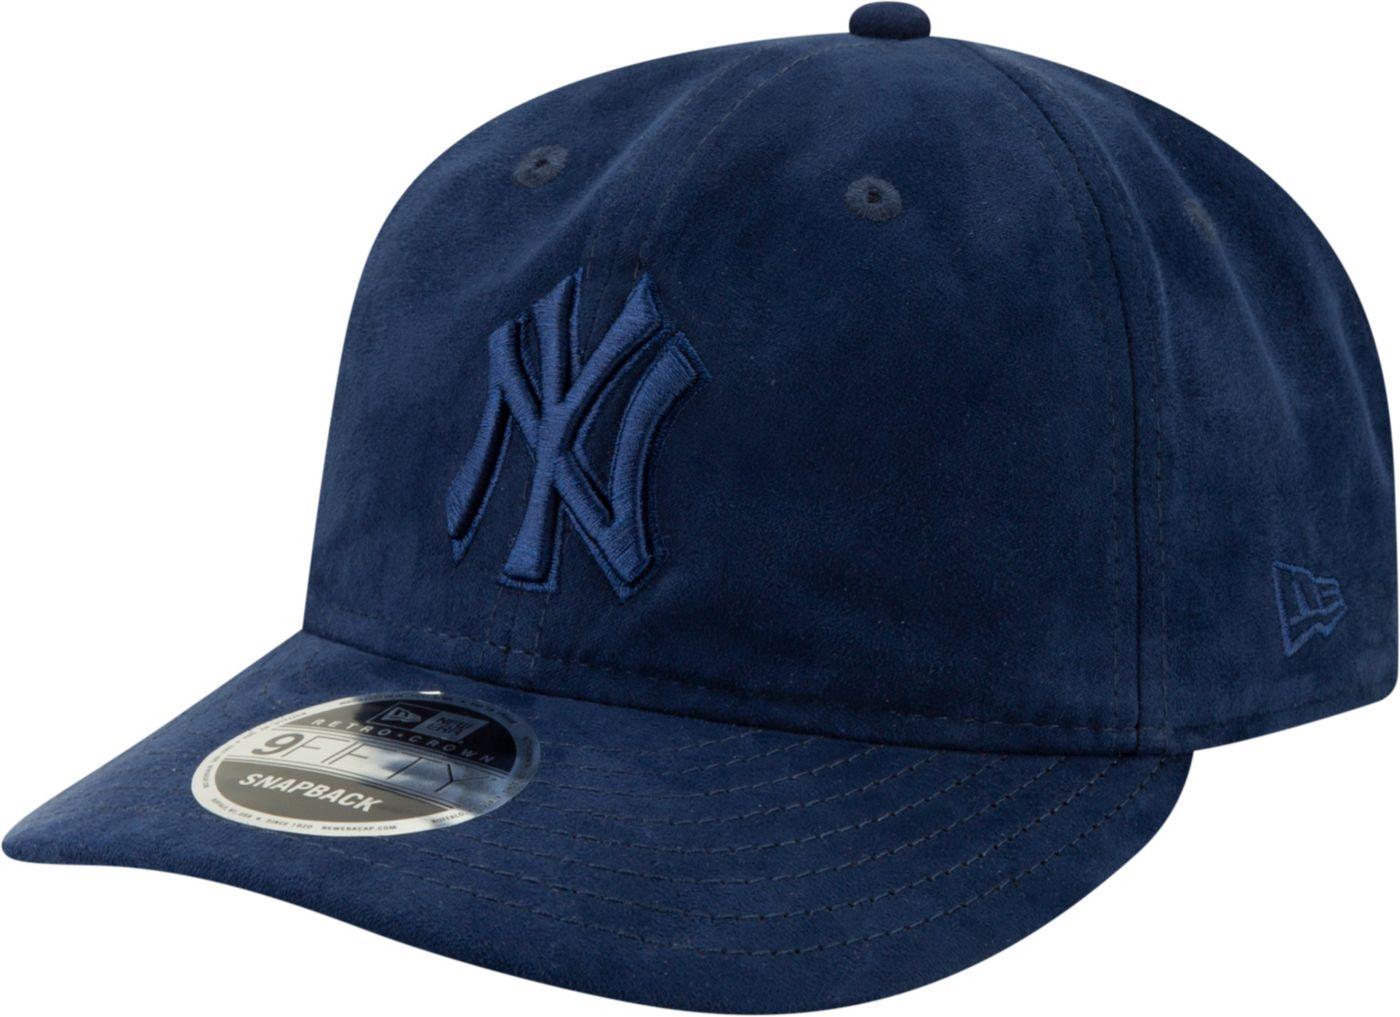 New Era Men's New York Yankees 9Fifty Suede Retro Navy Adjustable Snapback Hat